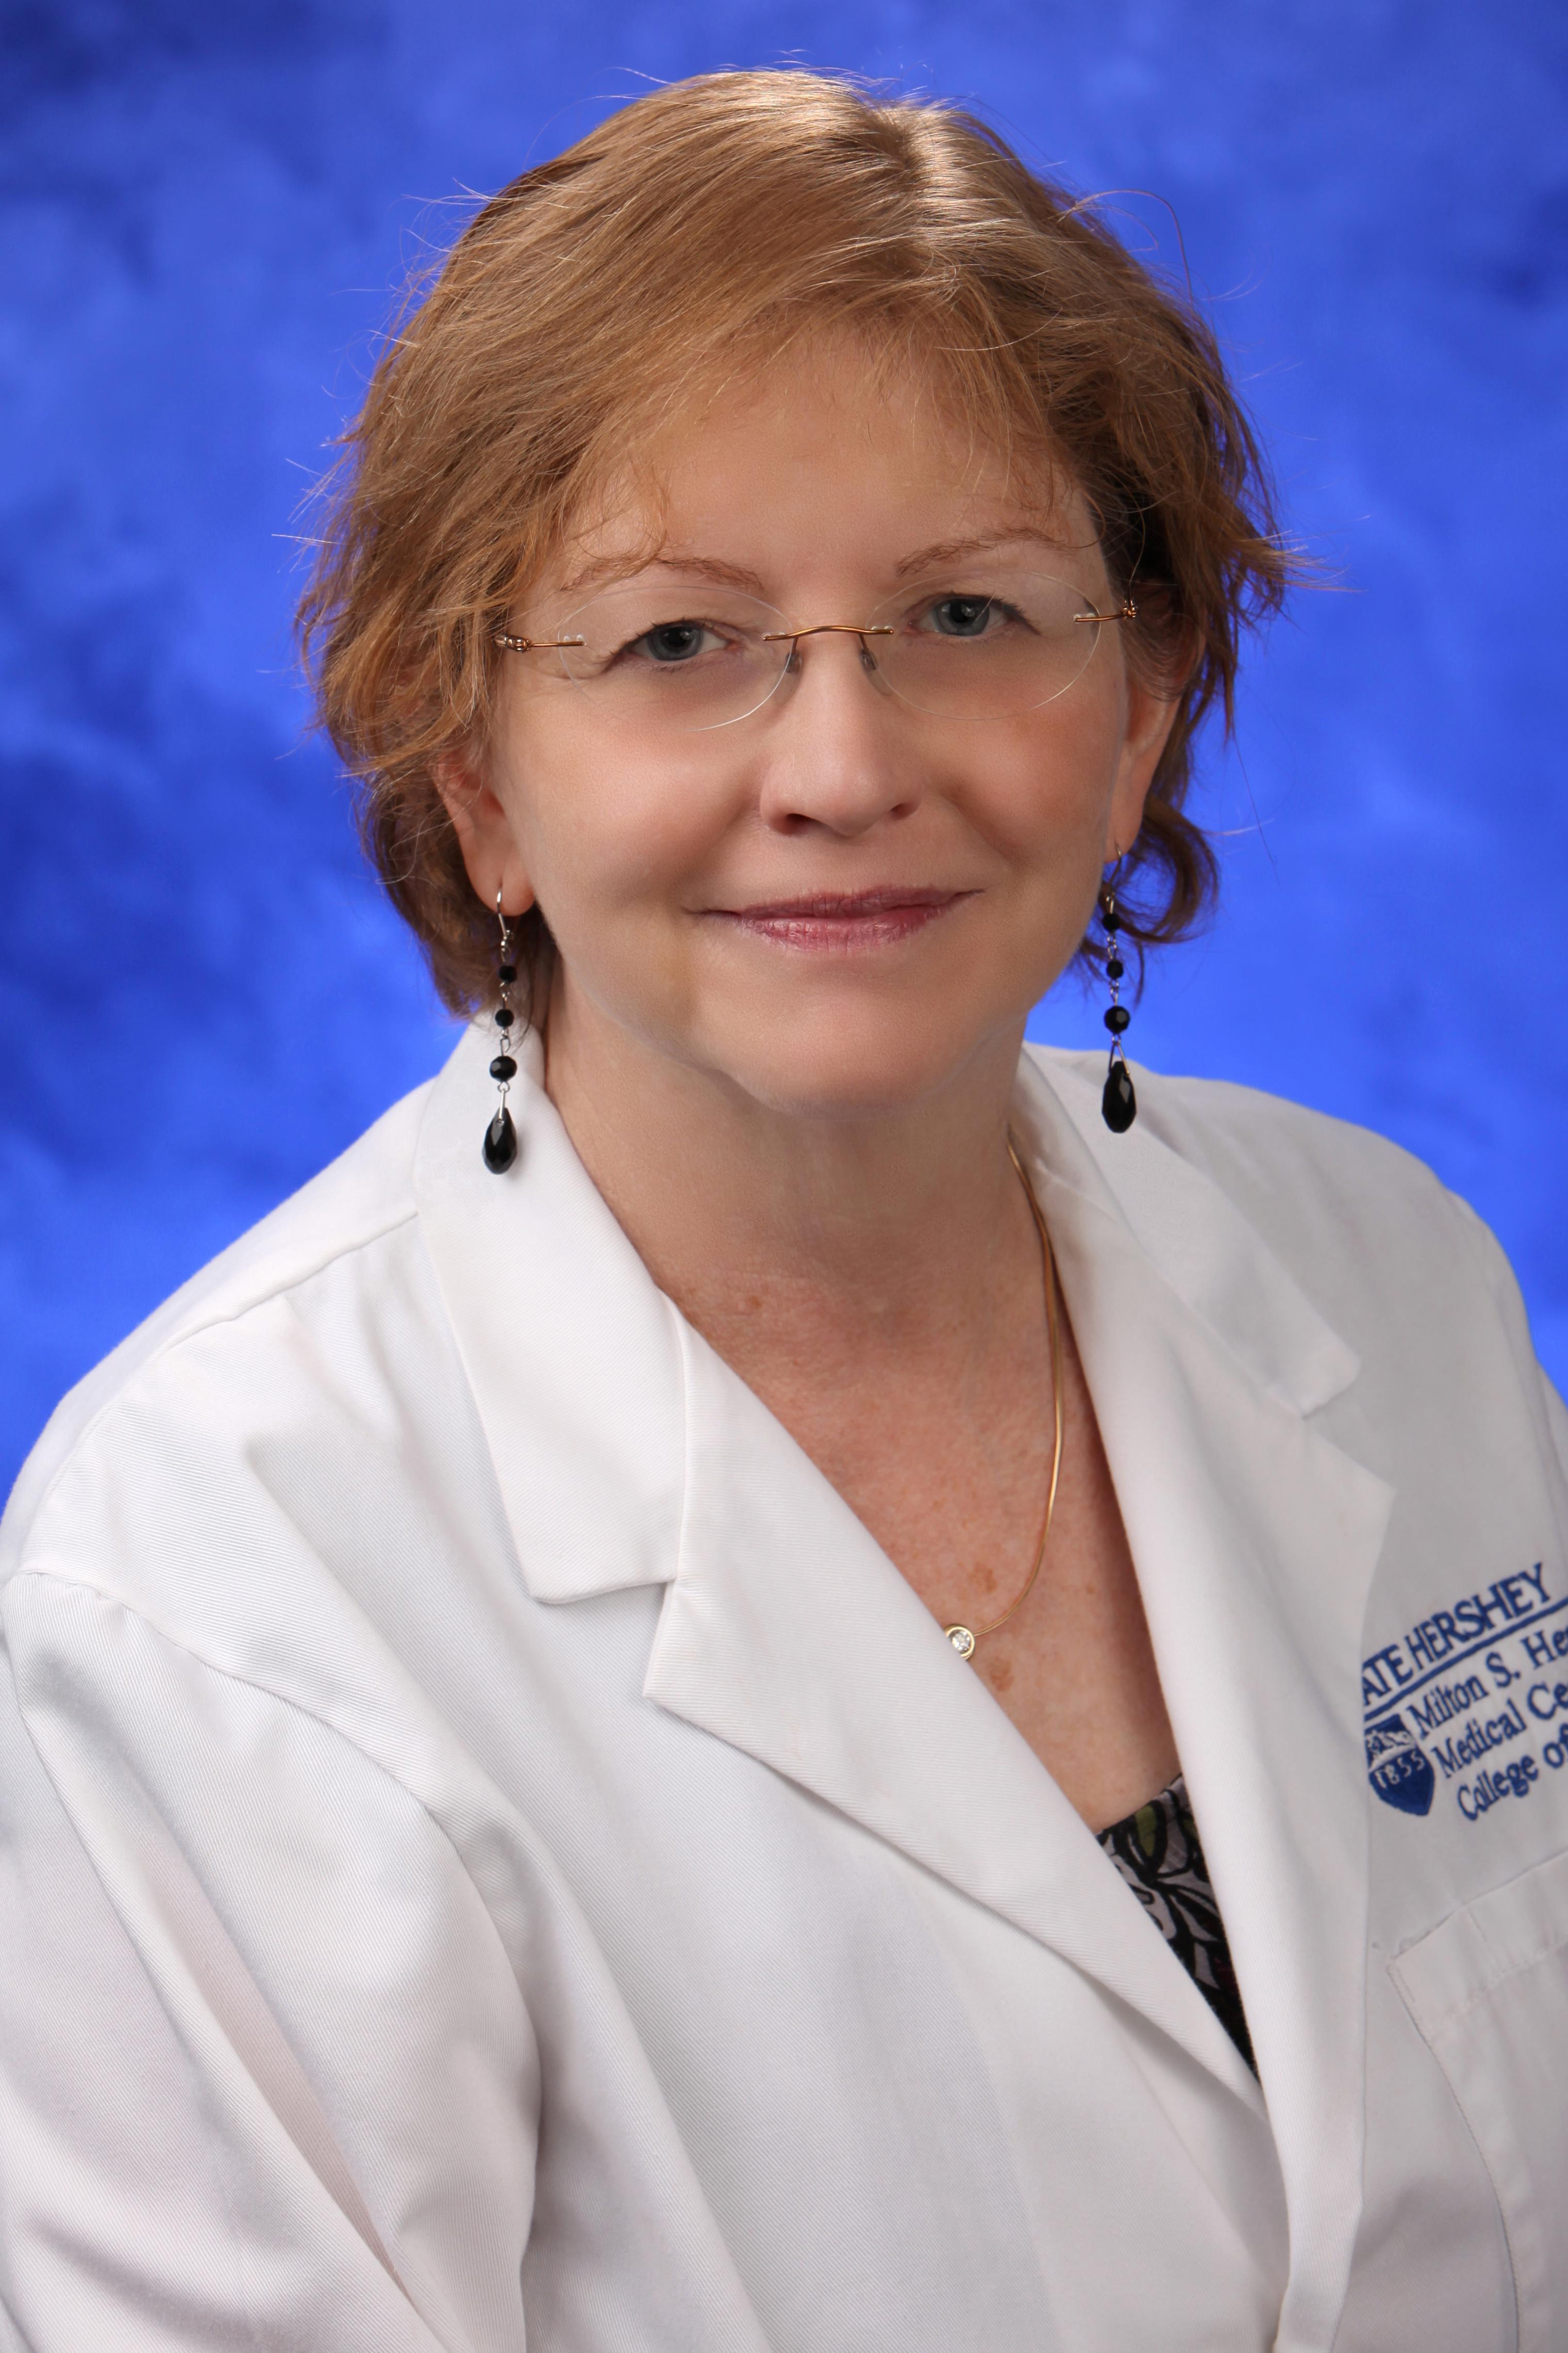 Dr. Lori Frasier